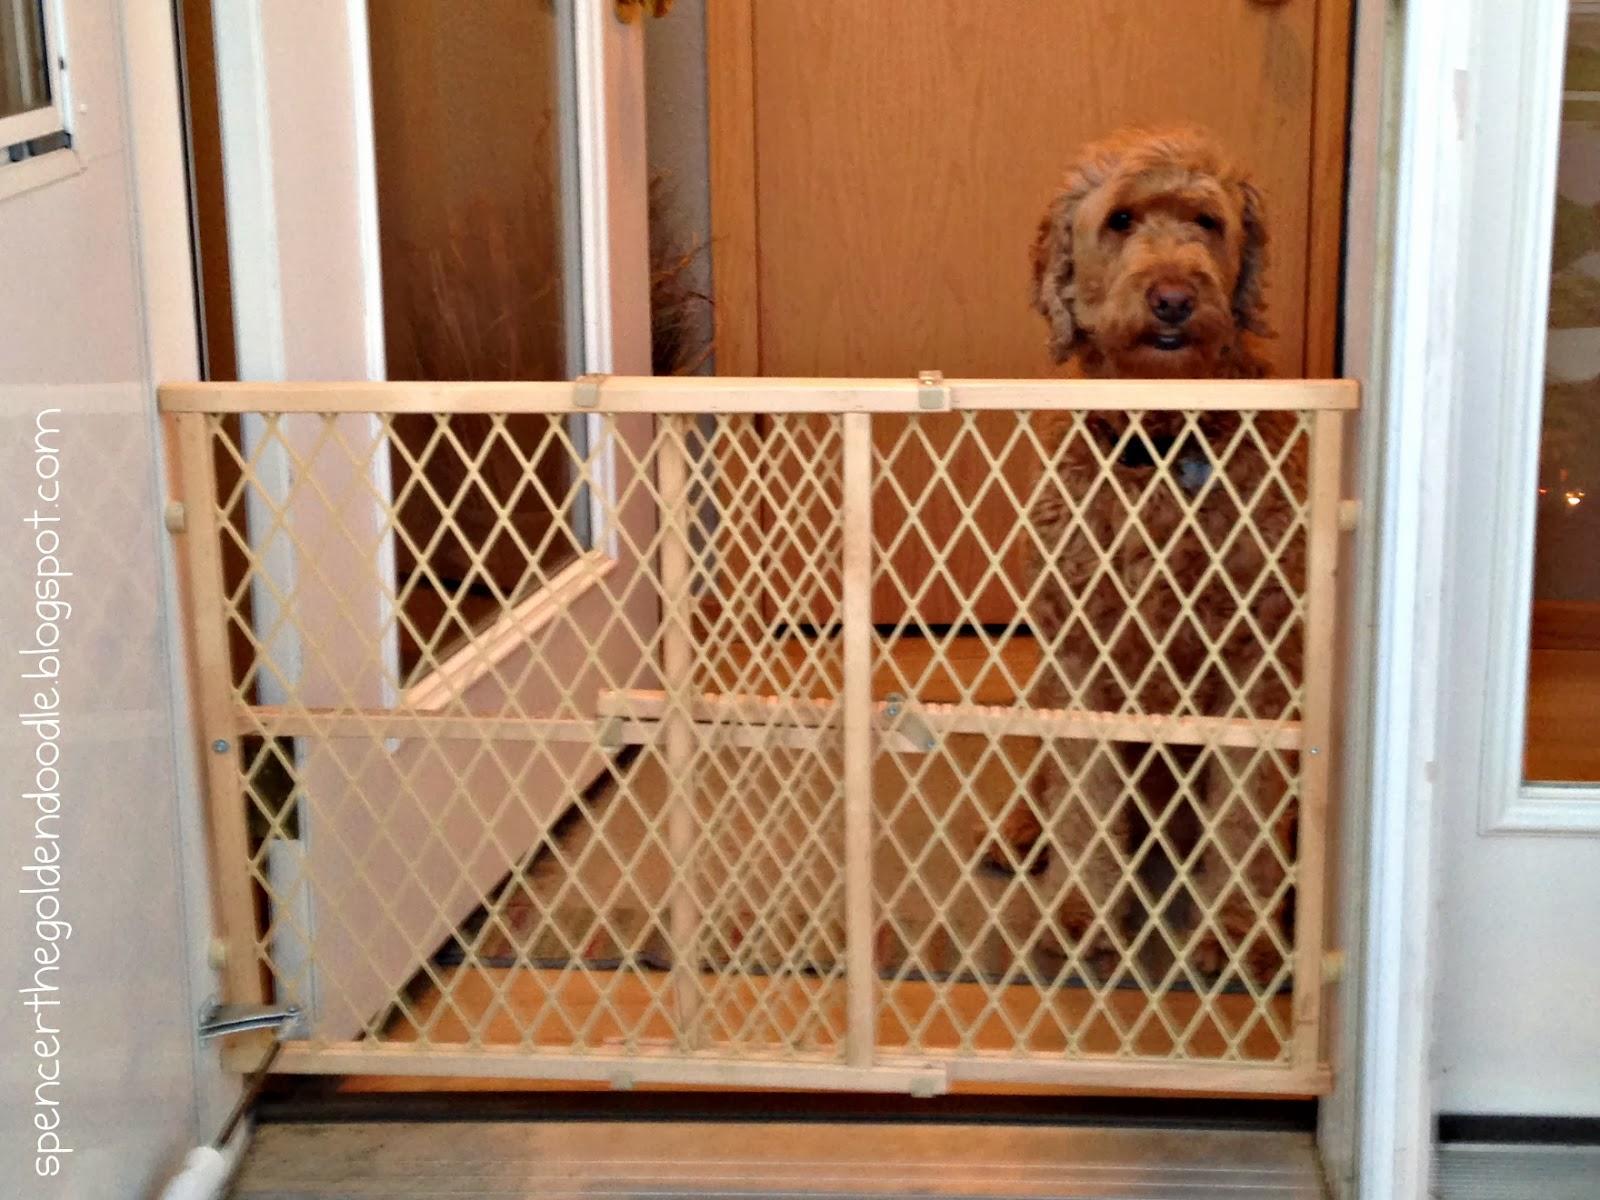 HMH Designs: DIY Dog Gate from a Bench - A Tutorial